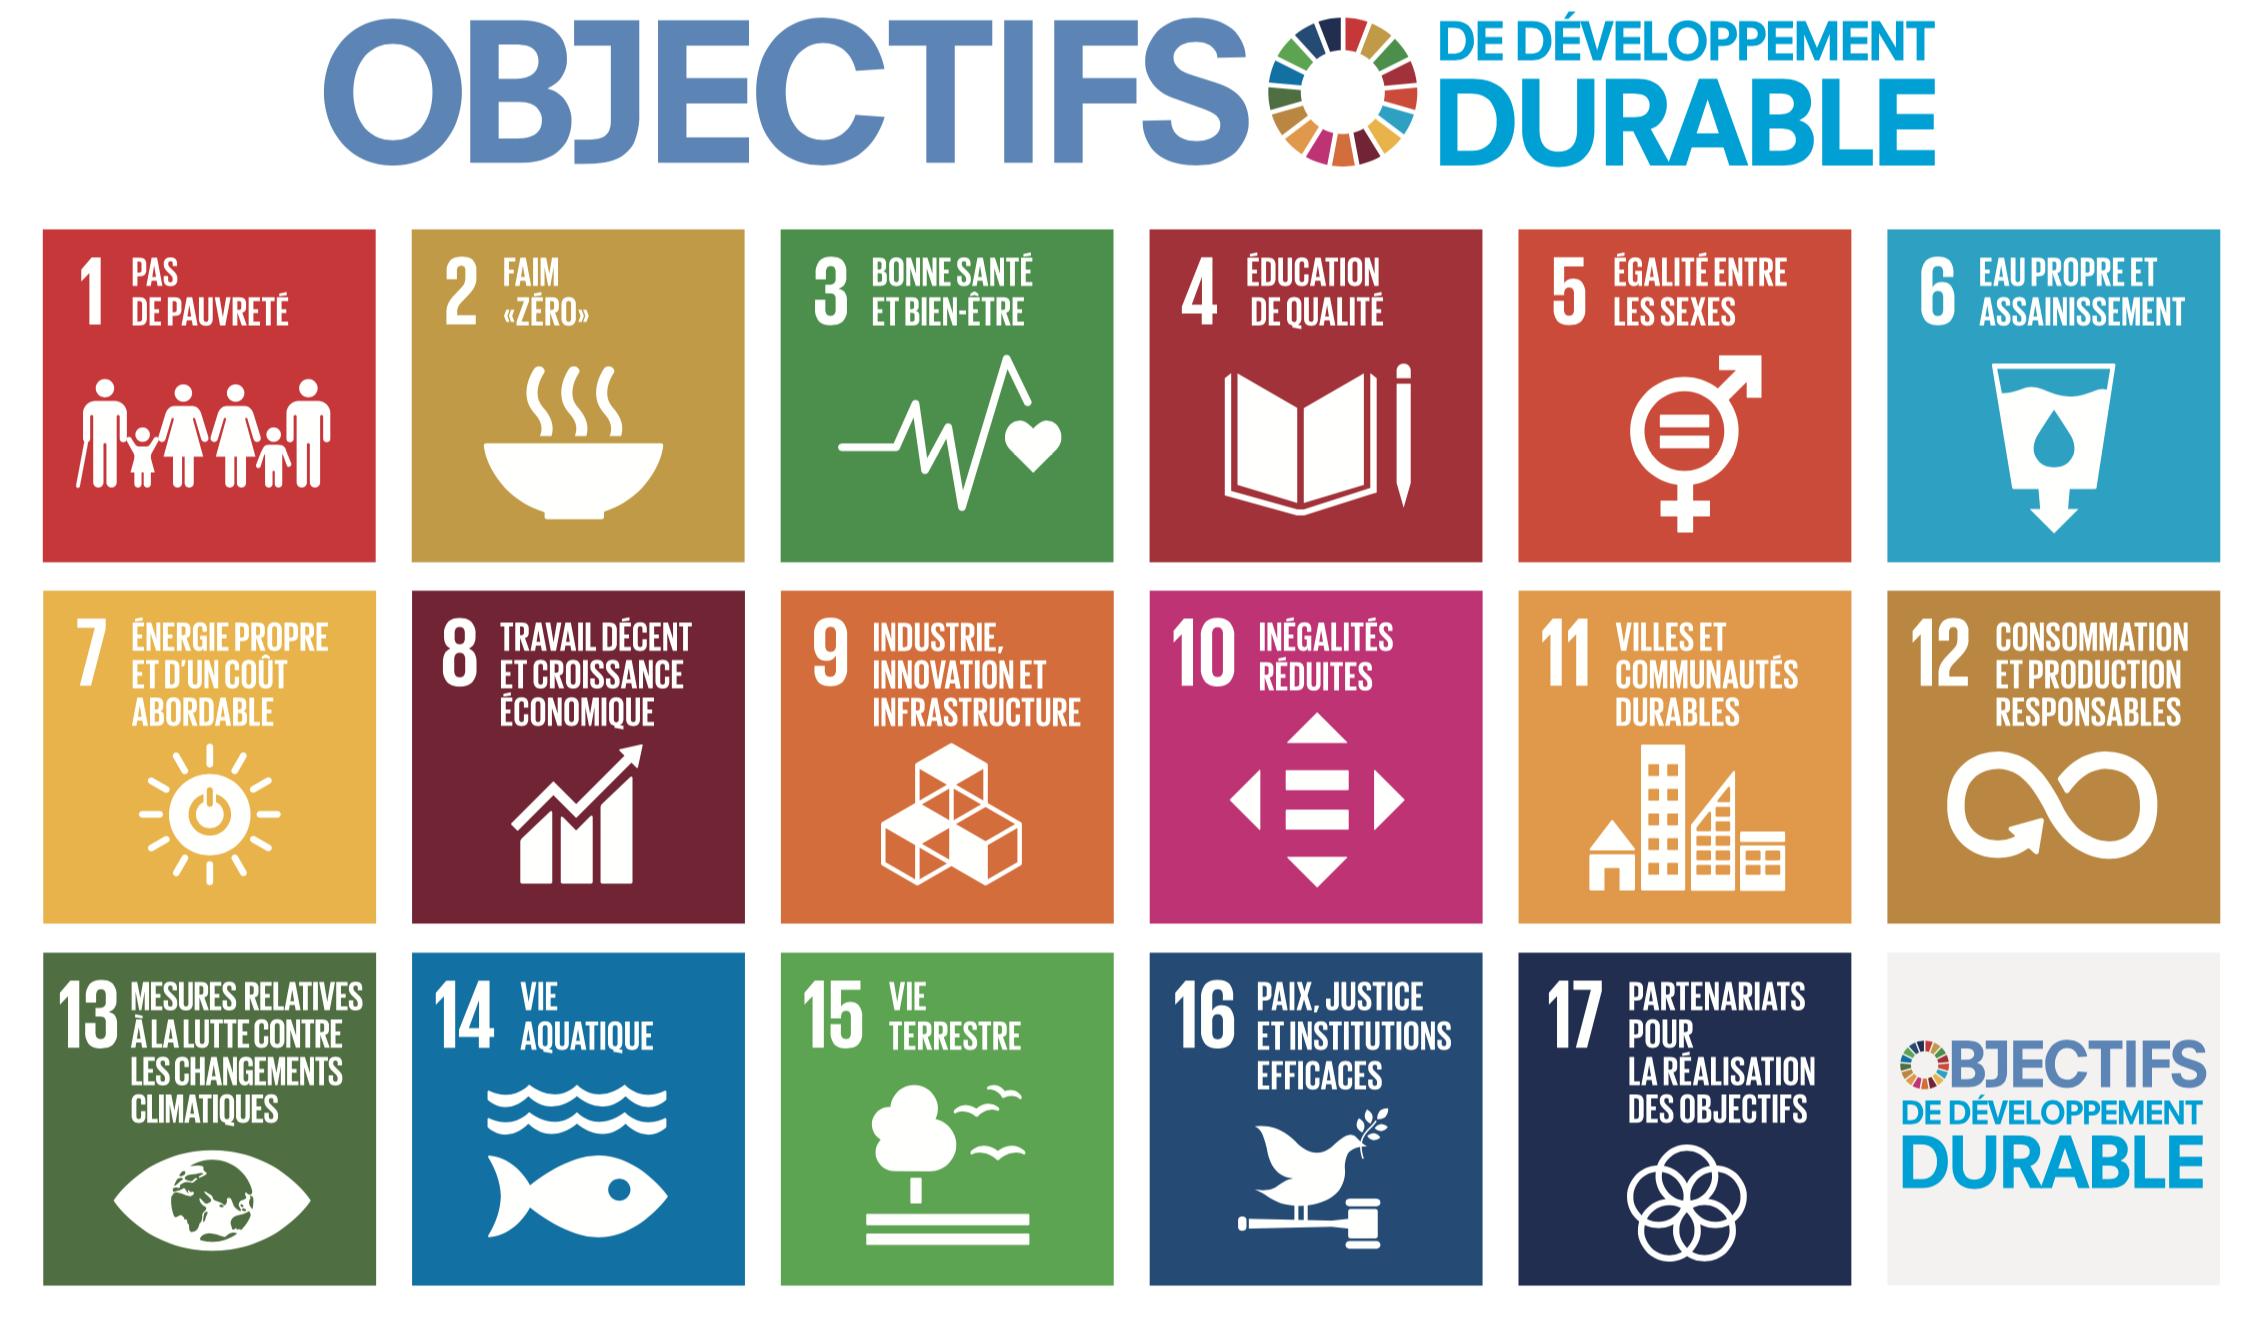 poster_odd_objectifs_de_developpement_durable_logo.jpg.png